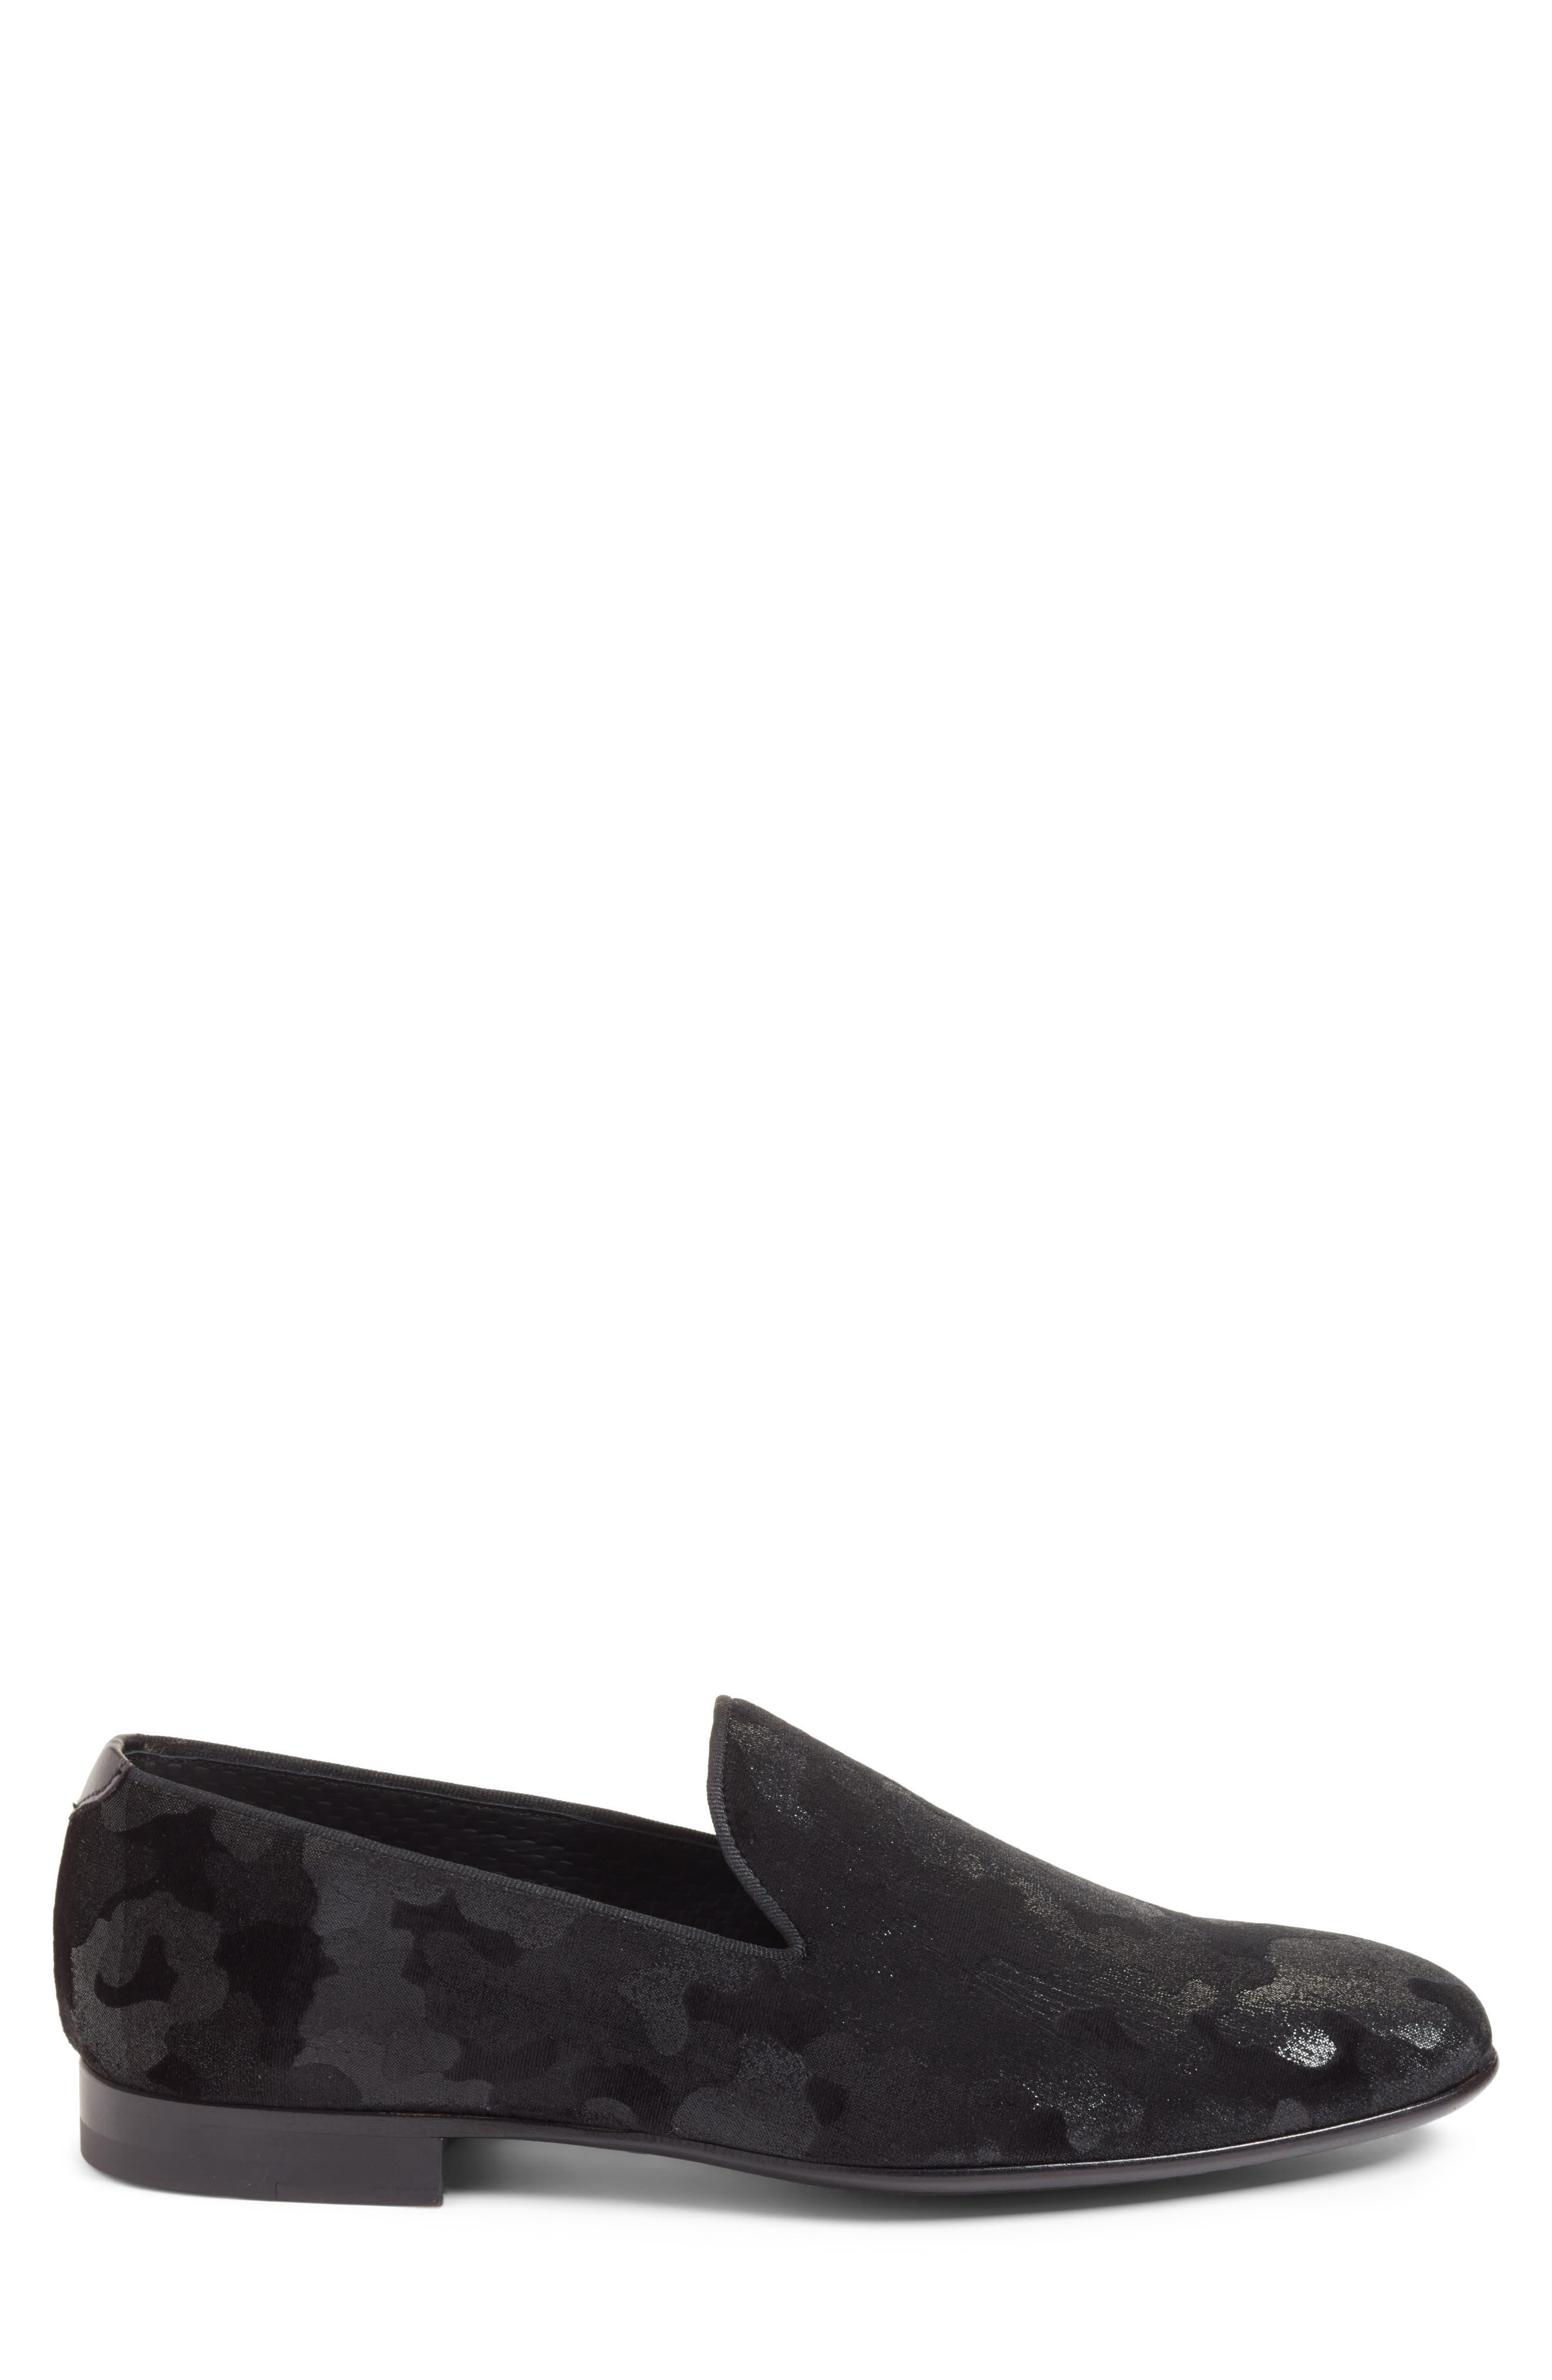 Delano Venetian Loafer,                             Alternate thumbnail 3, color,                             Black Camo